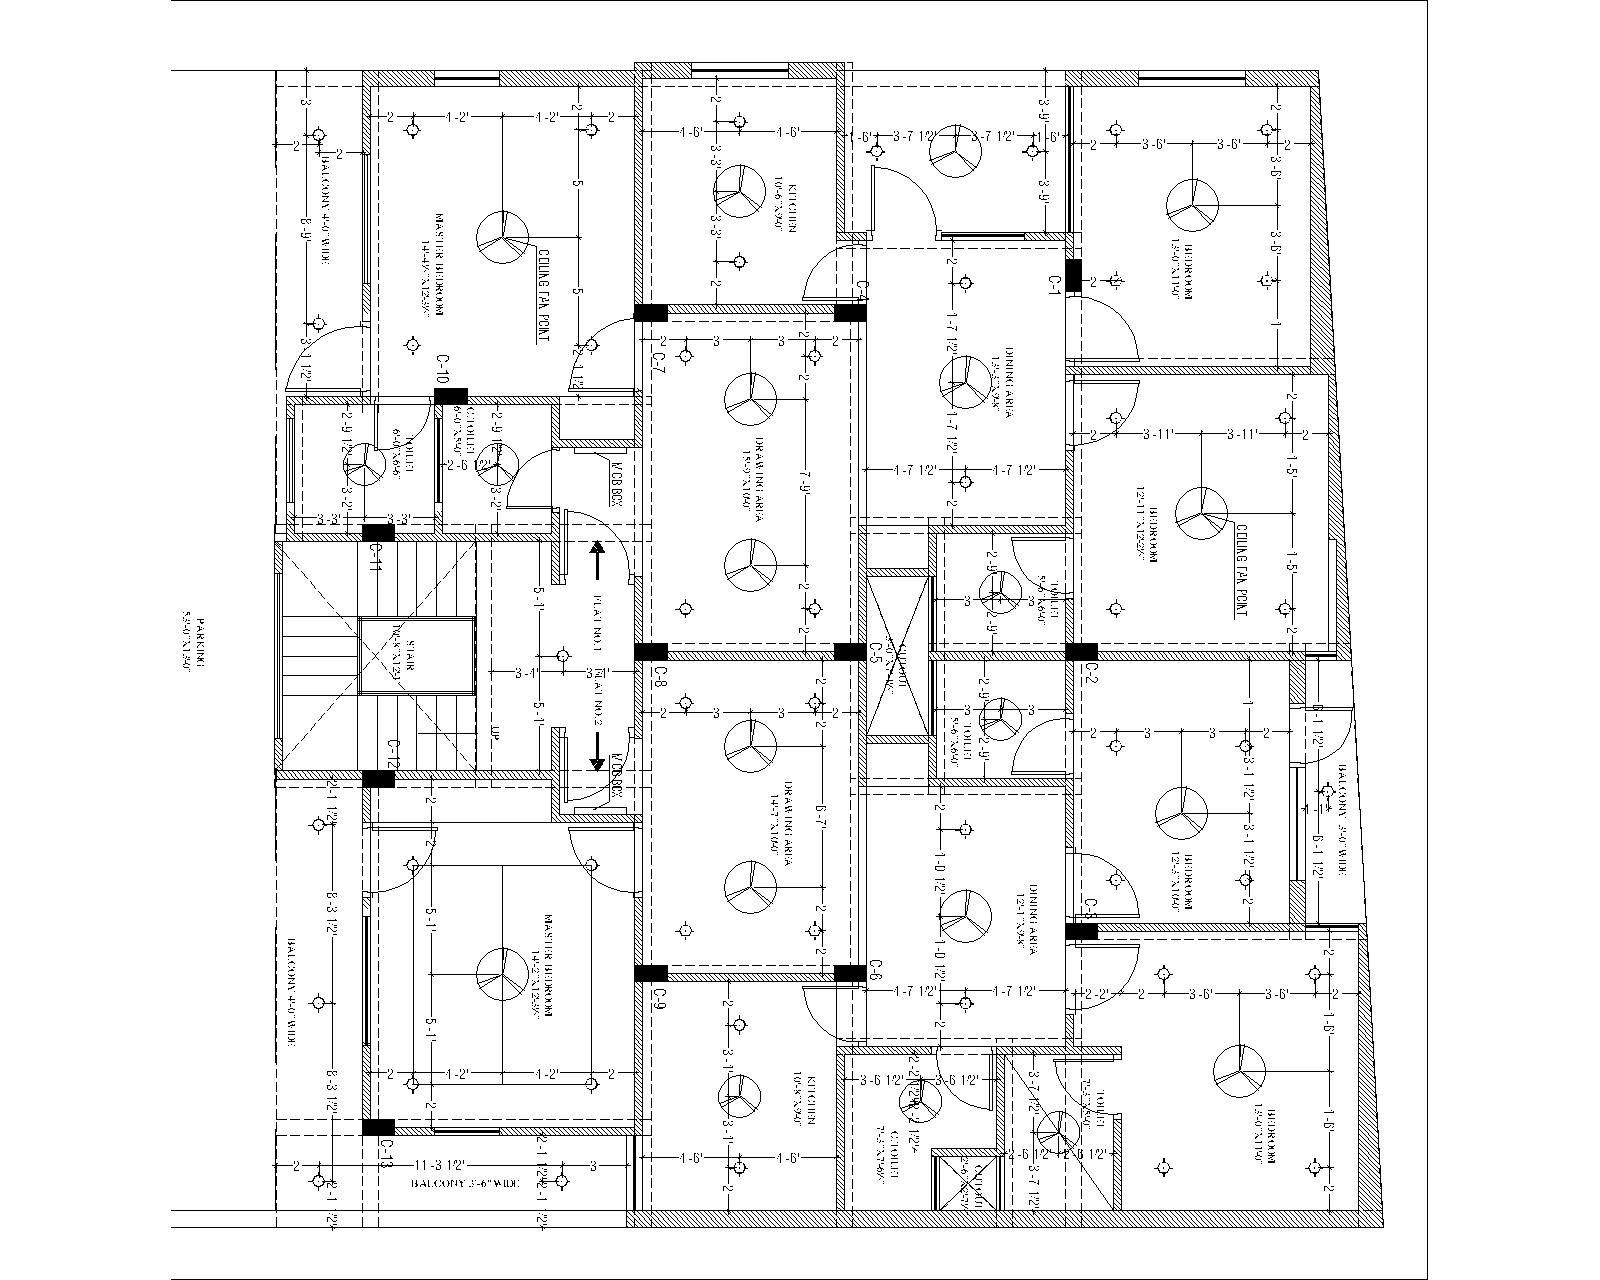 Architecture Ceiling Plan